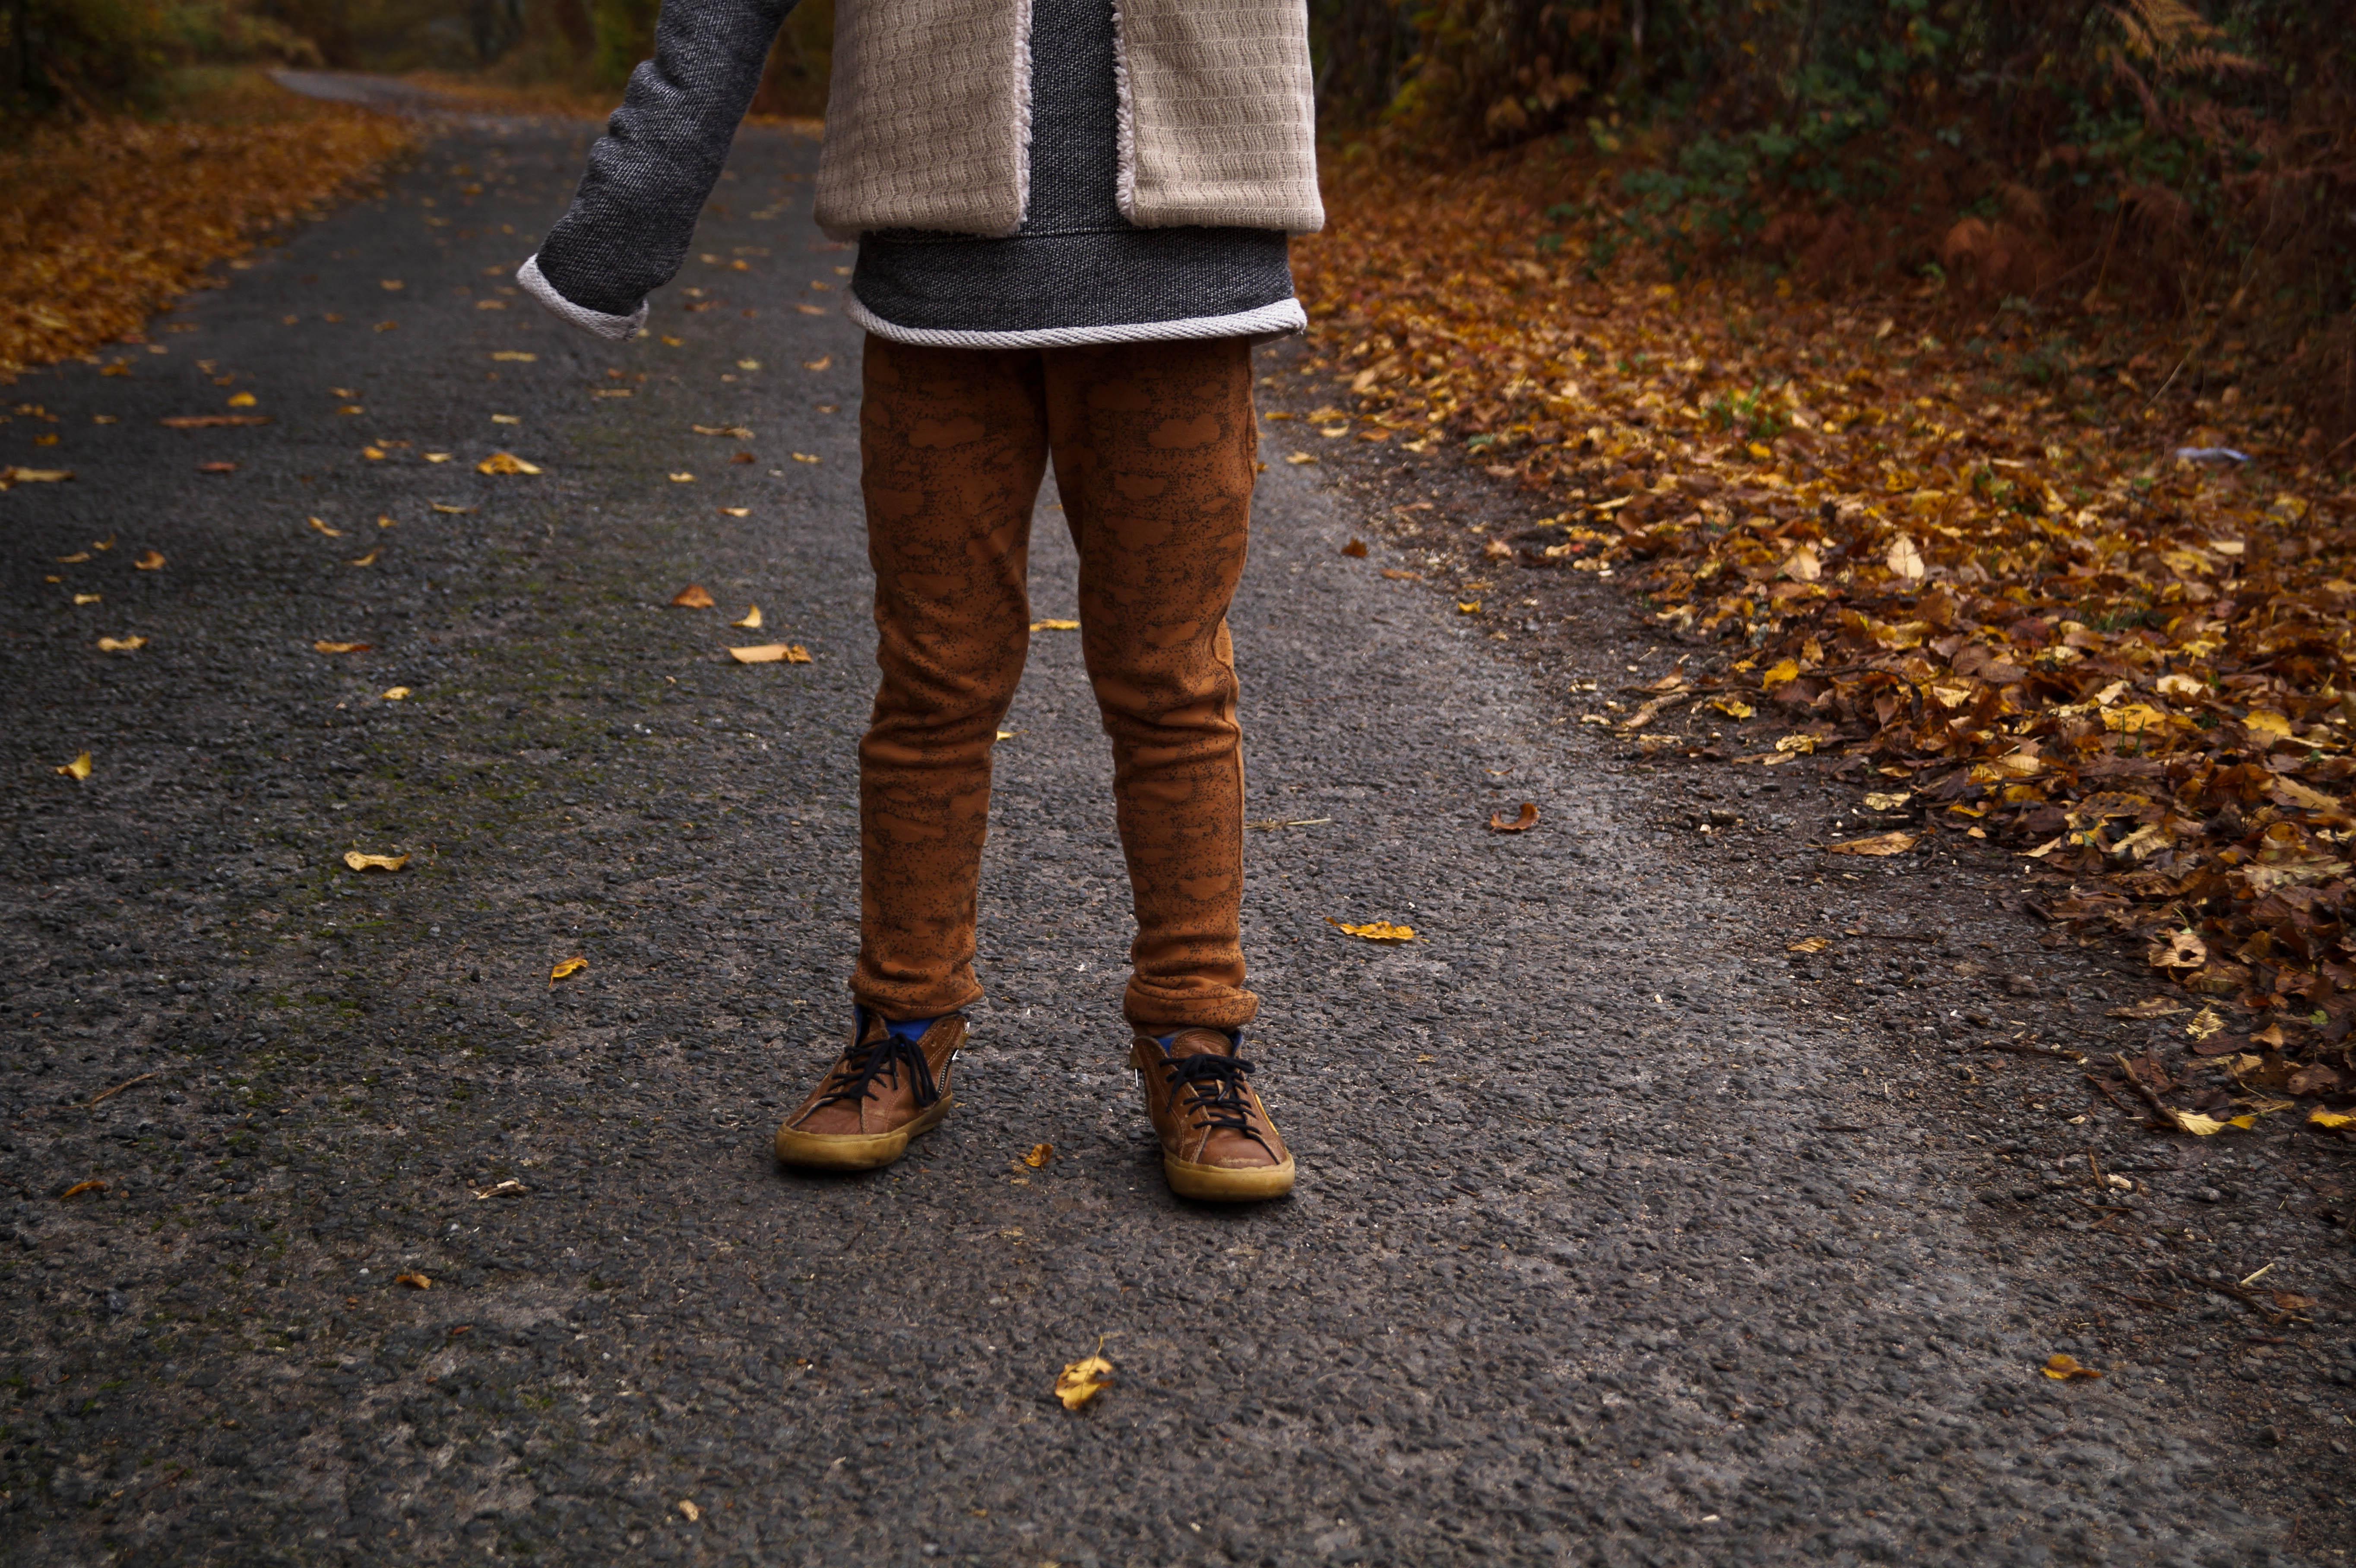 Shooting automne Minabulle garçon raleur pantalon nuages